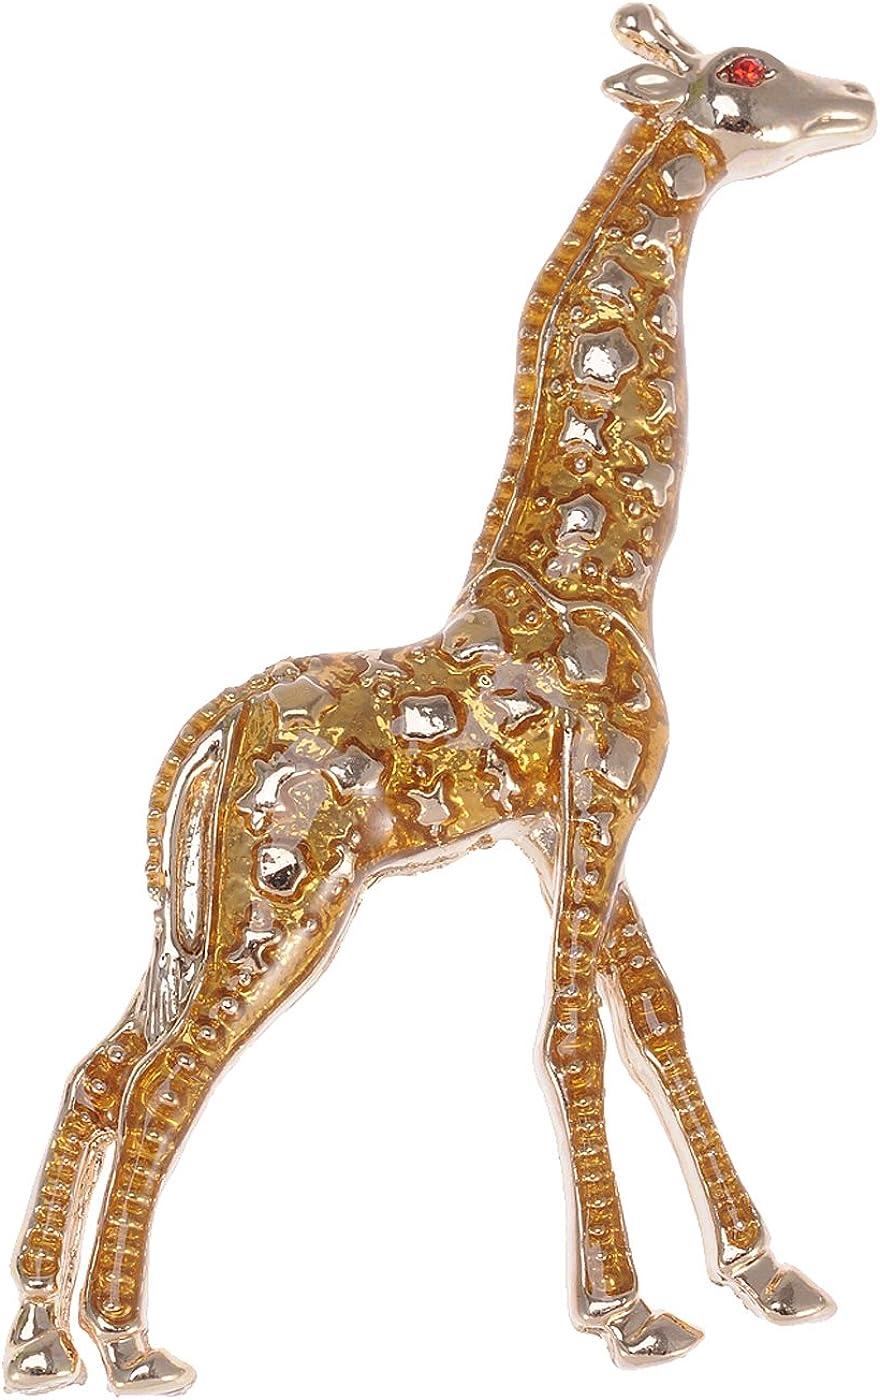 Alilang Golden Tone Yellow Animal Giraffe Spotted Texture Brooch Pin